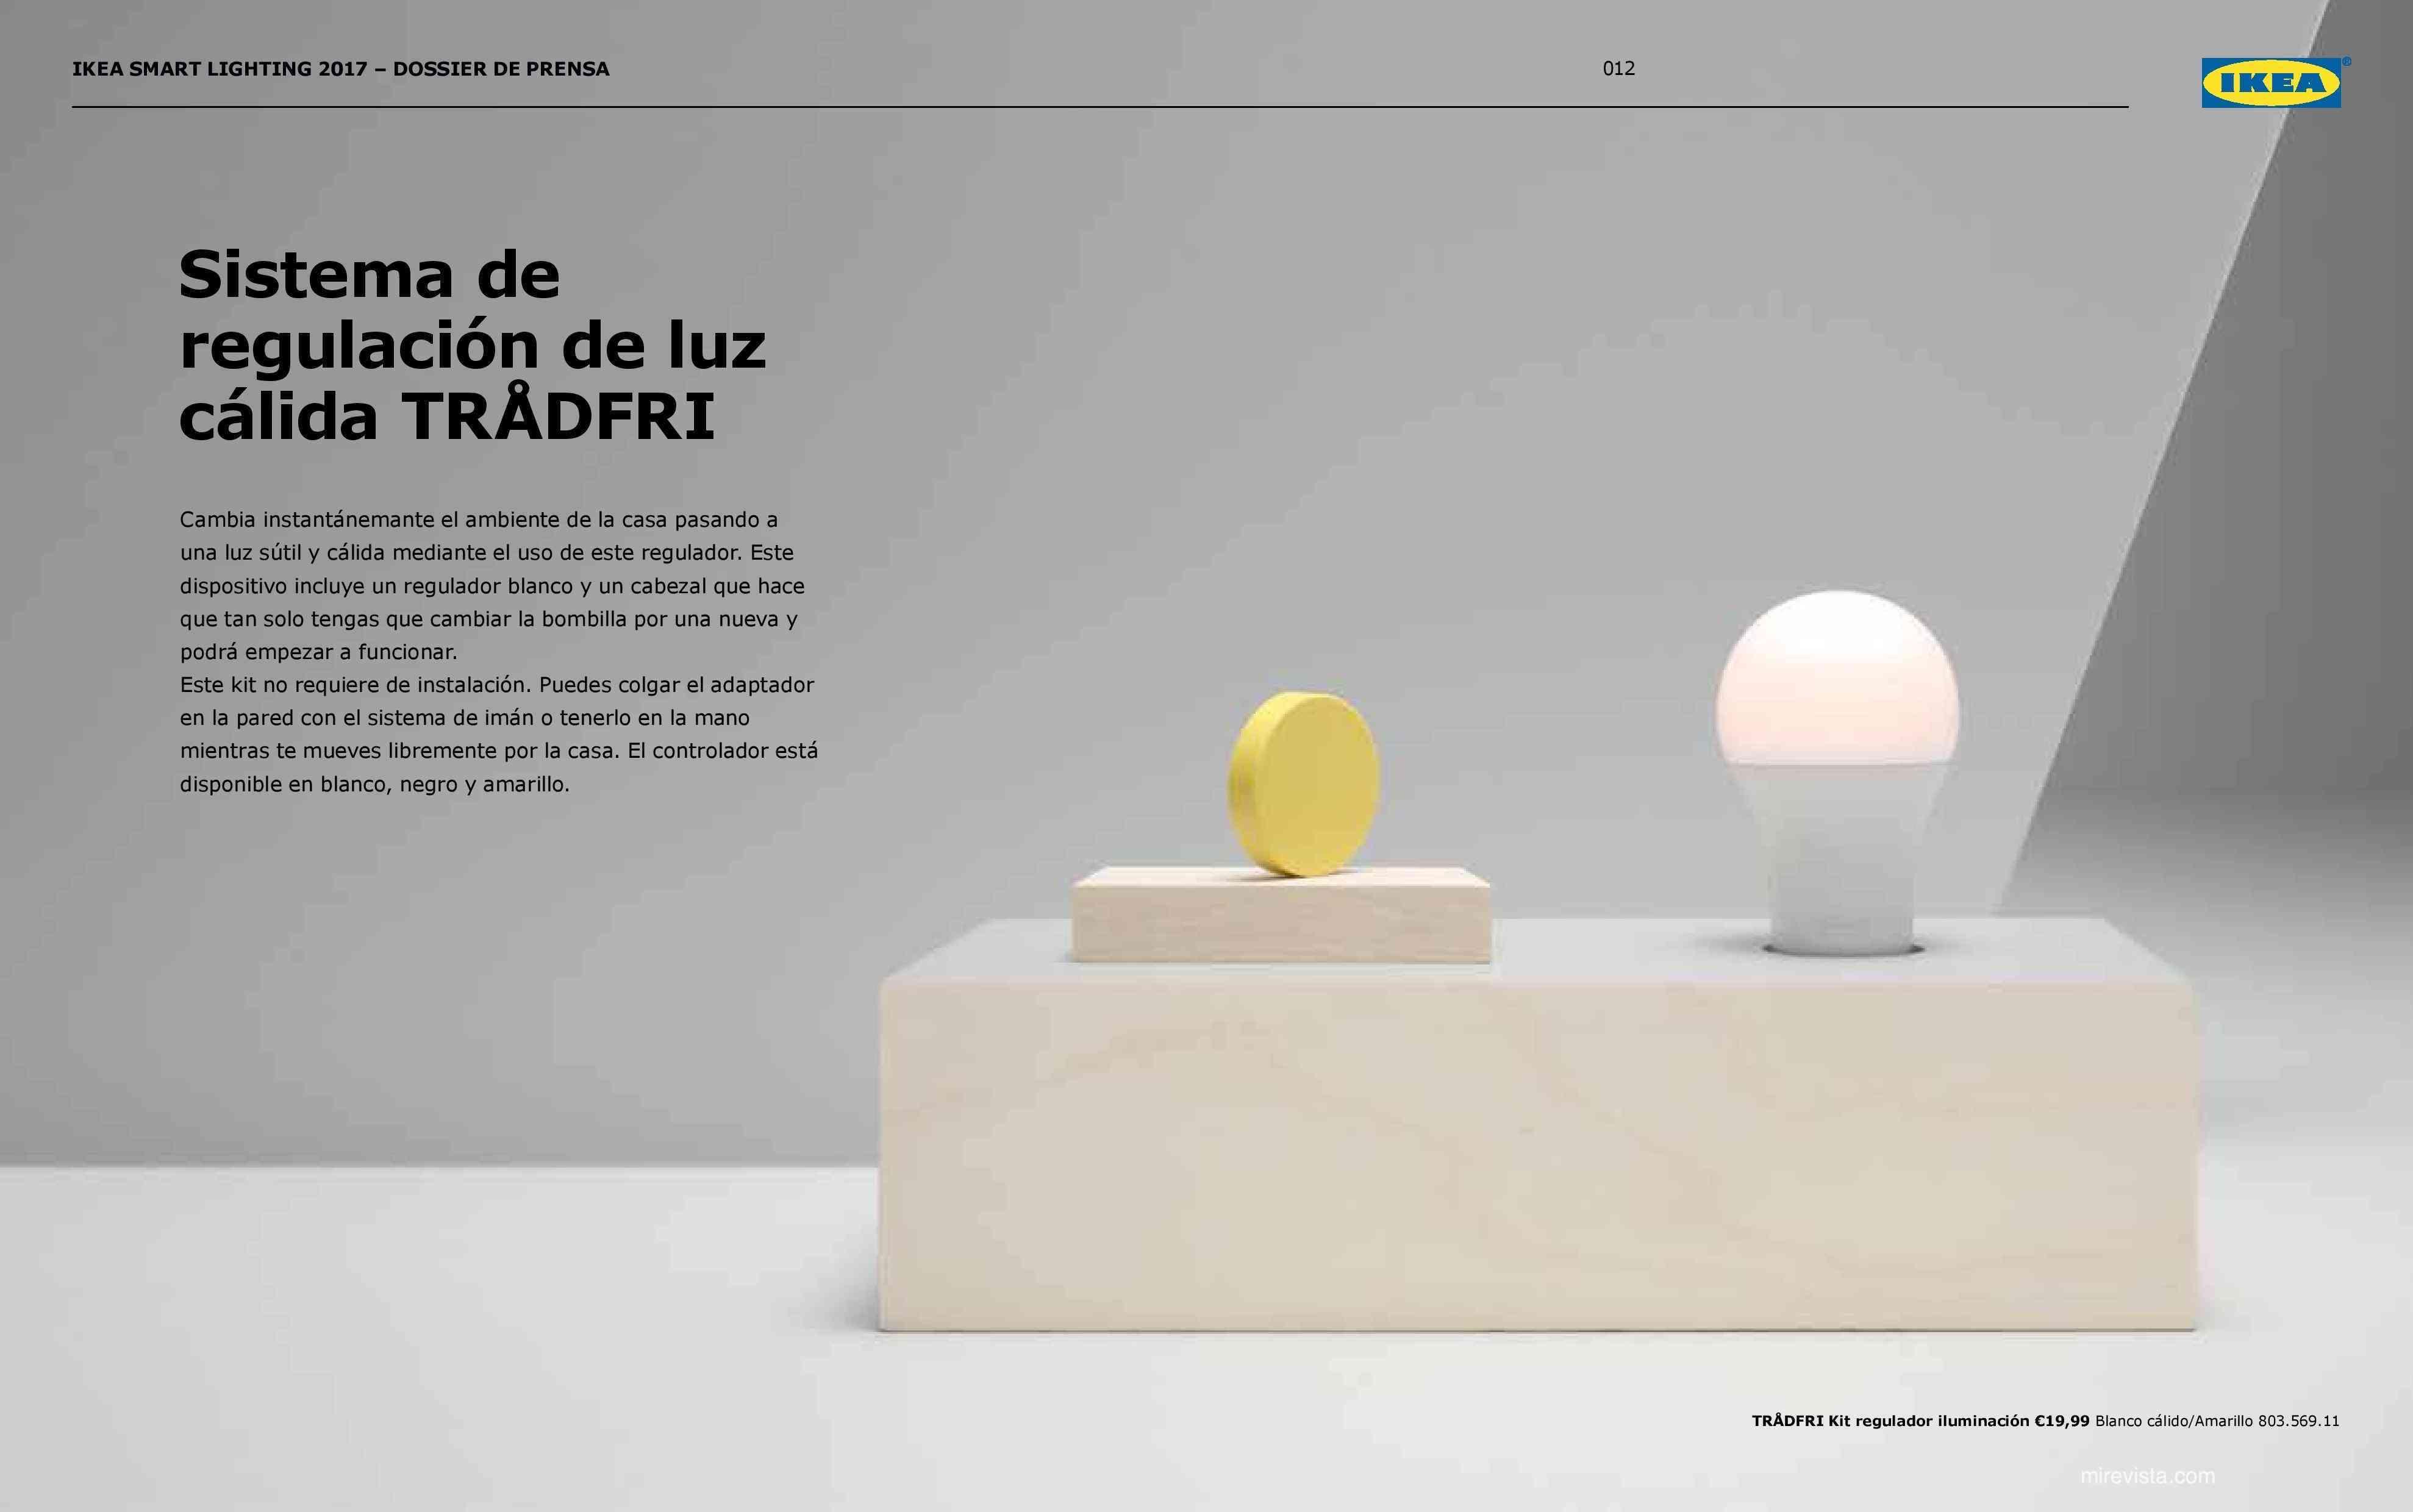 Novedades en iluminación de casas inteligentes con IKEA 68